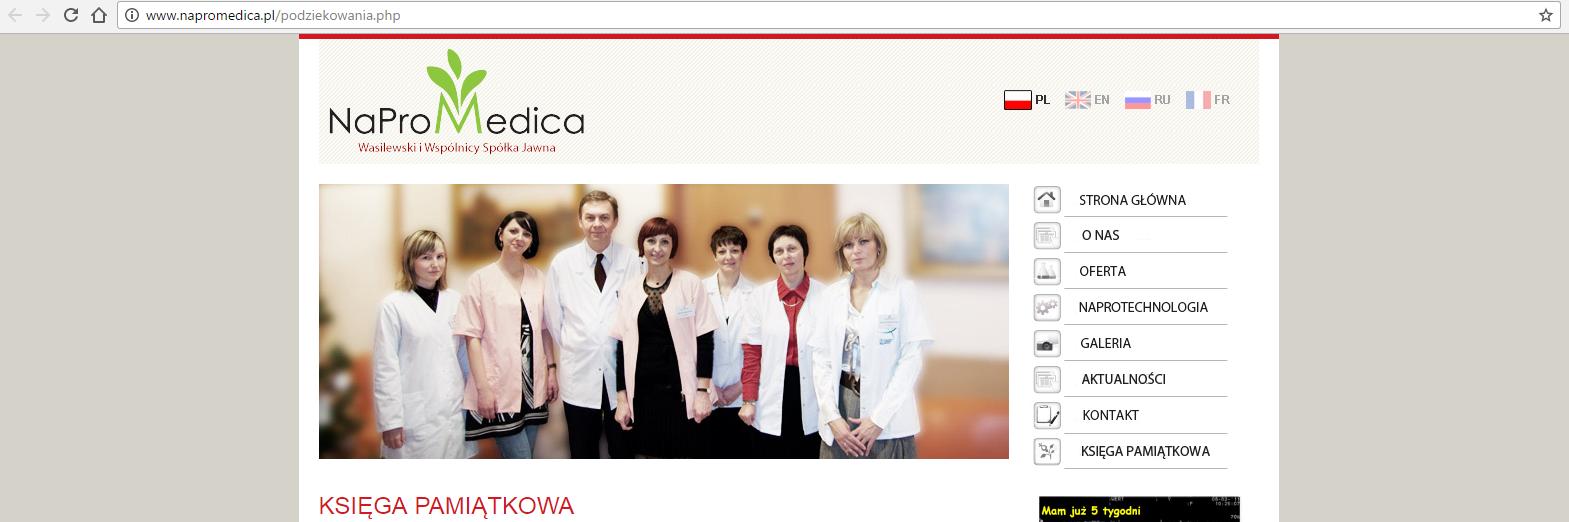 Świadectwa par na temat Naprotechnologii ze strony napromedica.pl